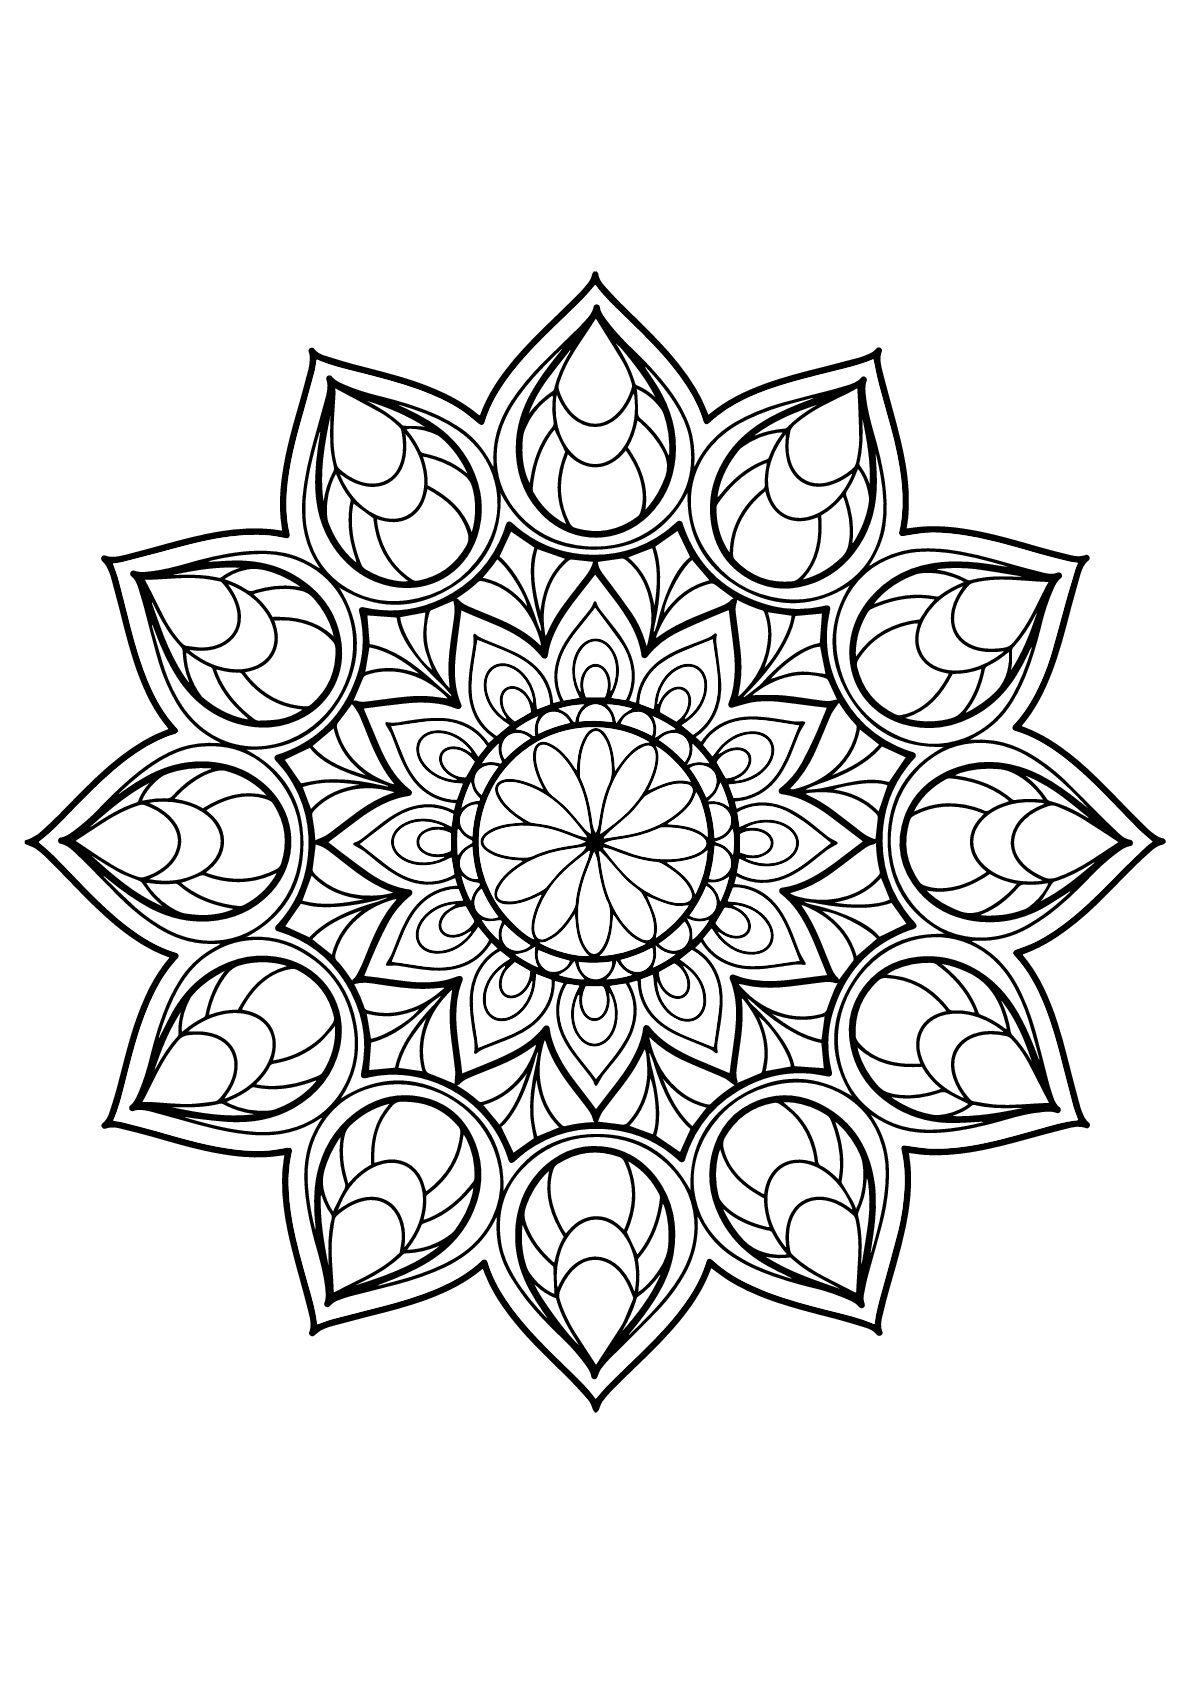 mandala coloring pages free printable mandala coloring pages getcoloringpagescom pages free printable coloring mandala